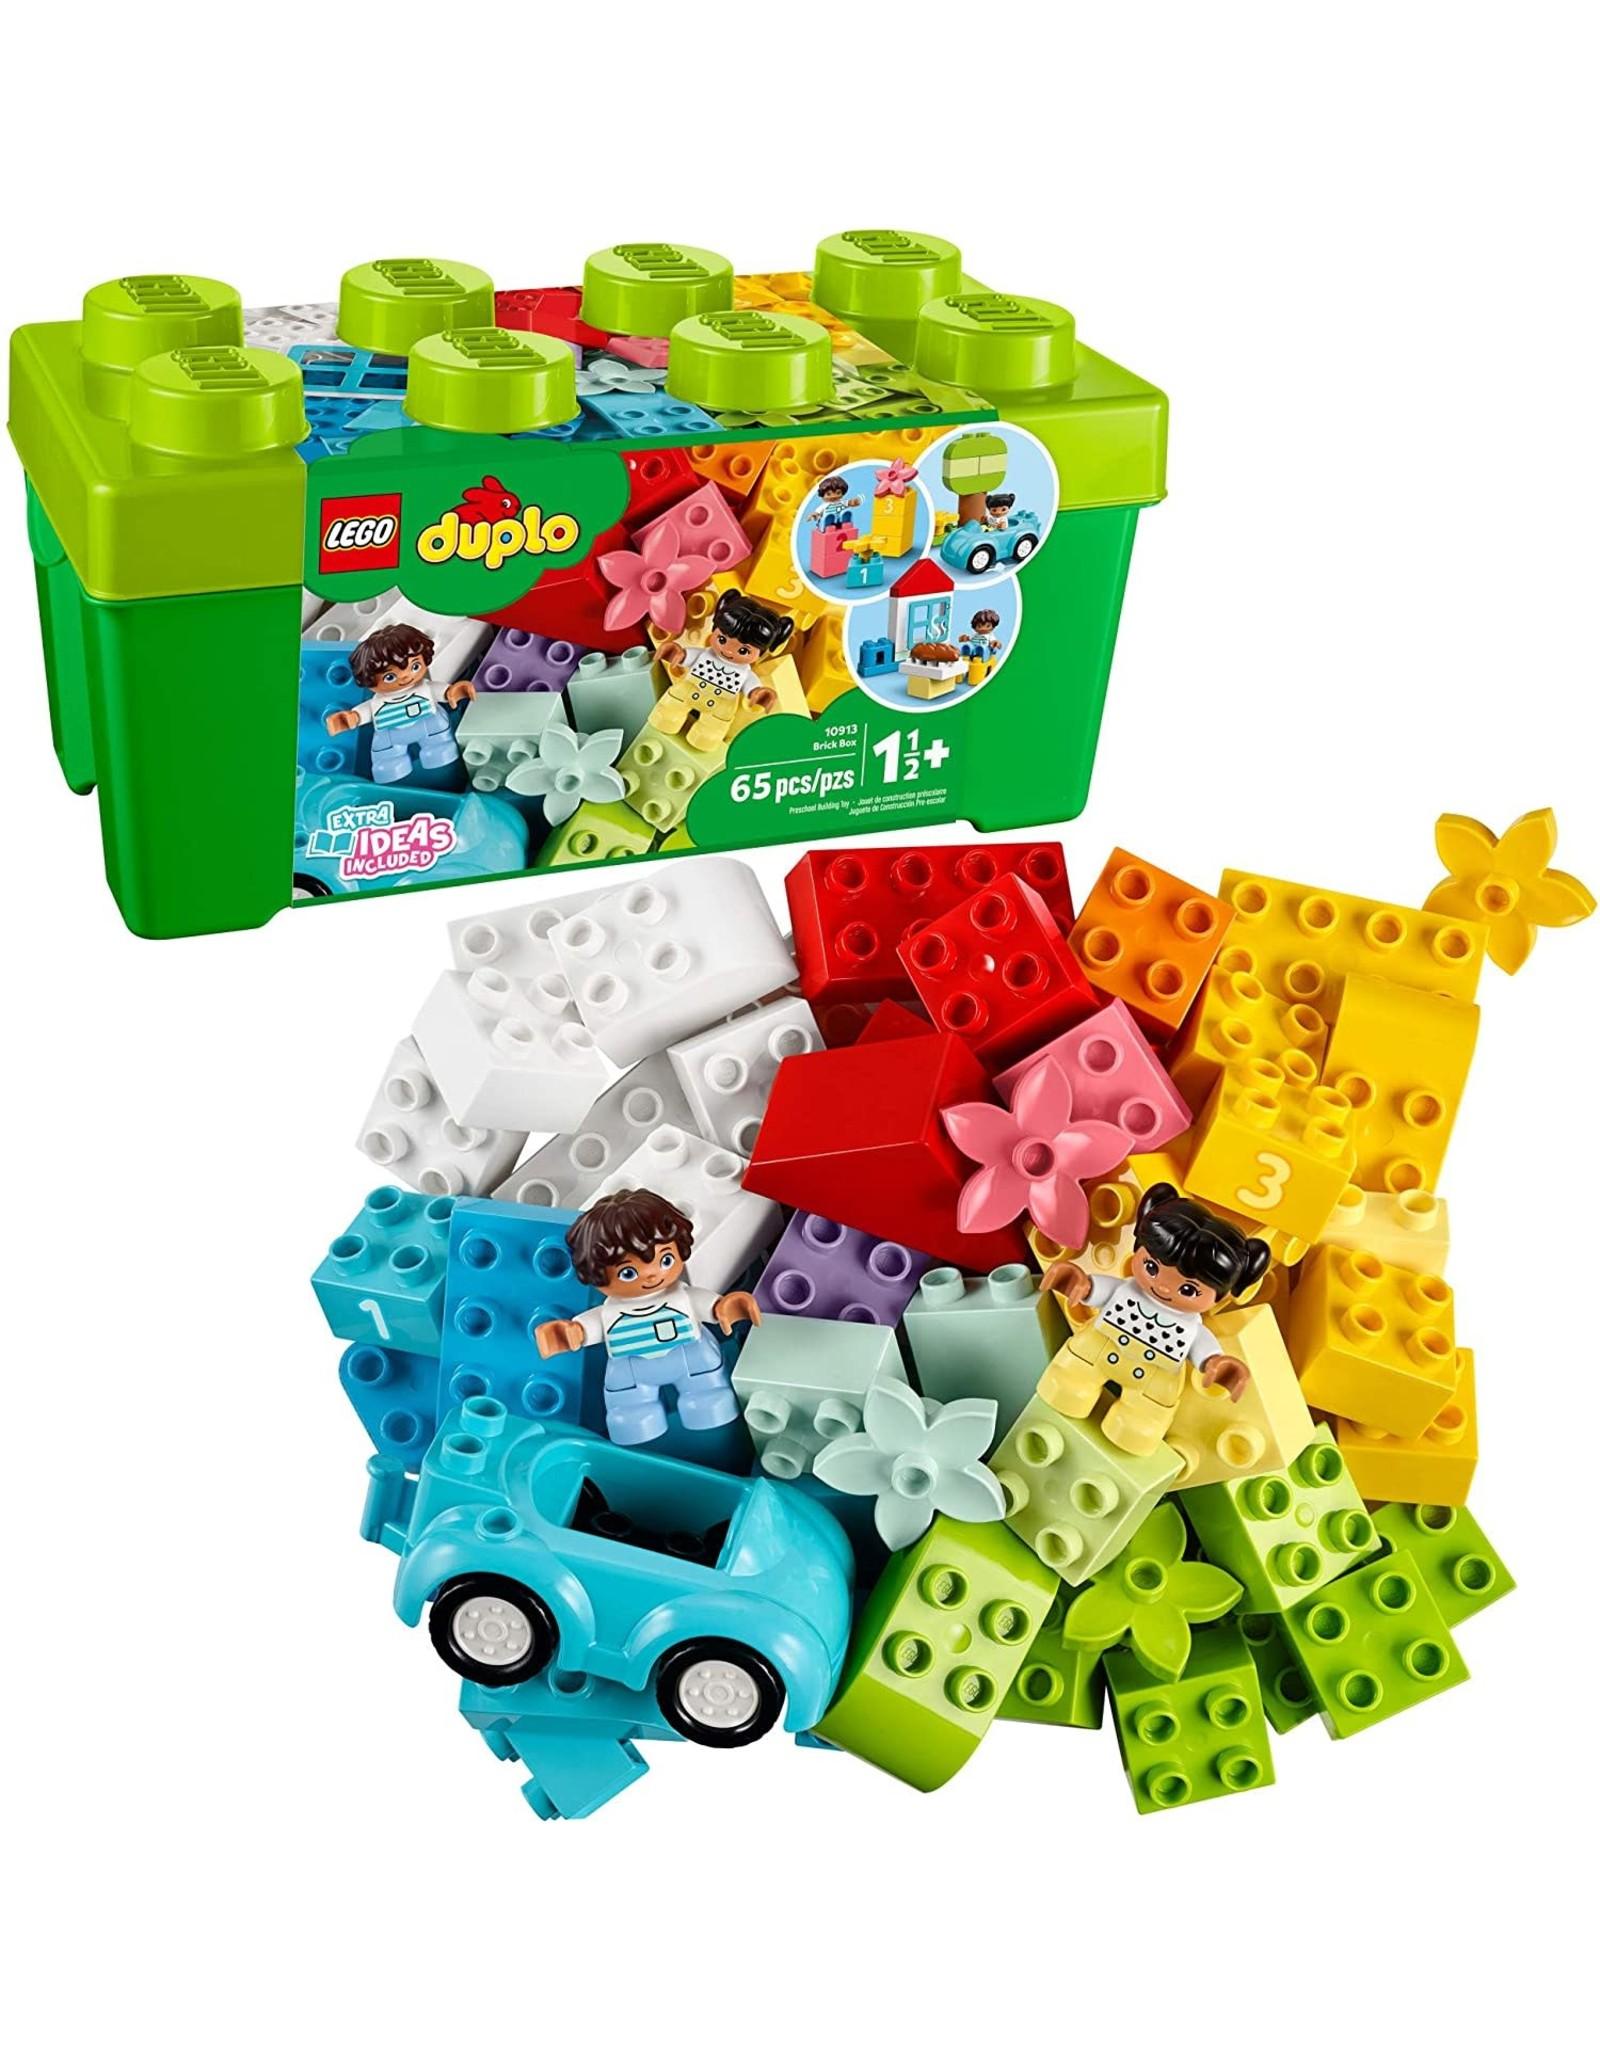 Duplo Brick Box